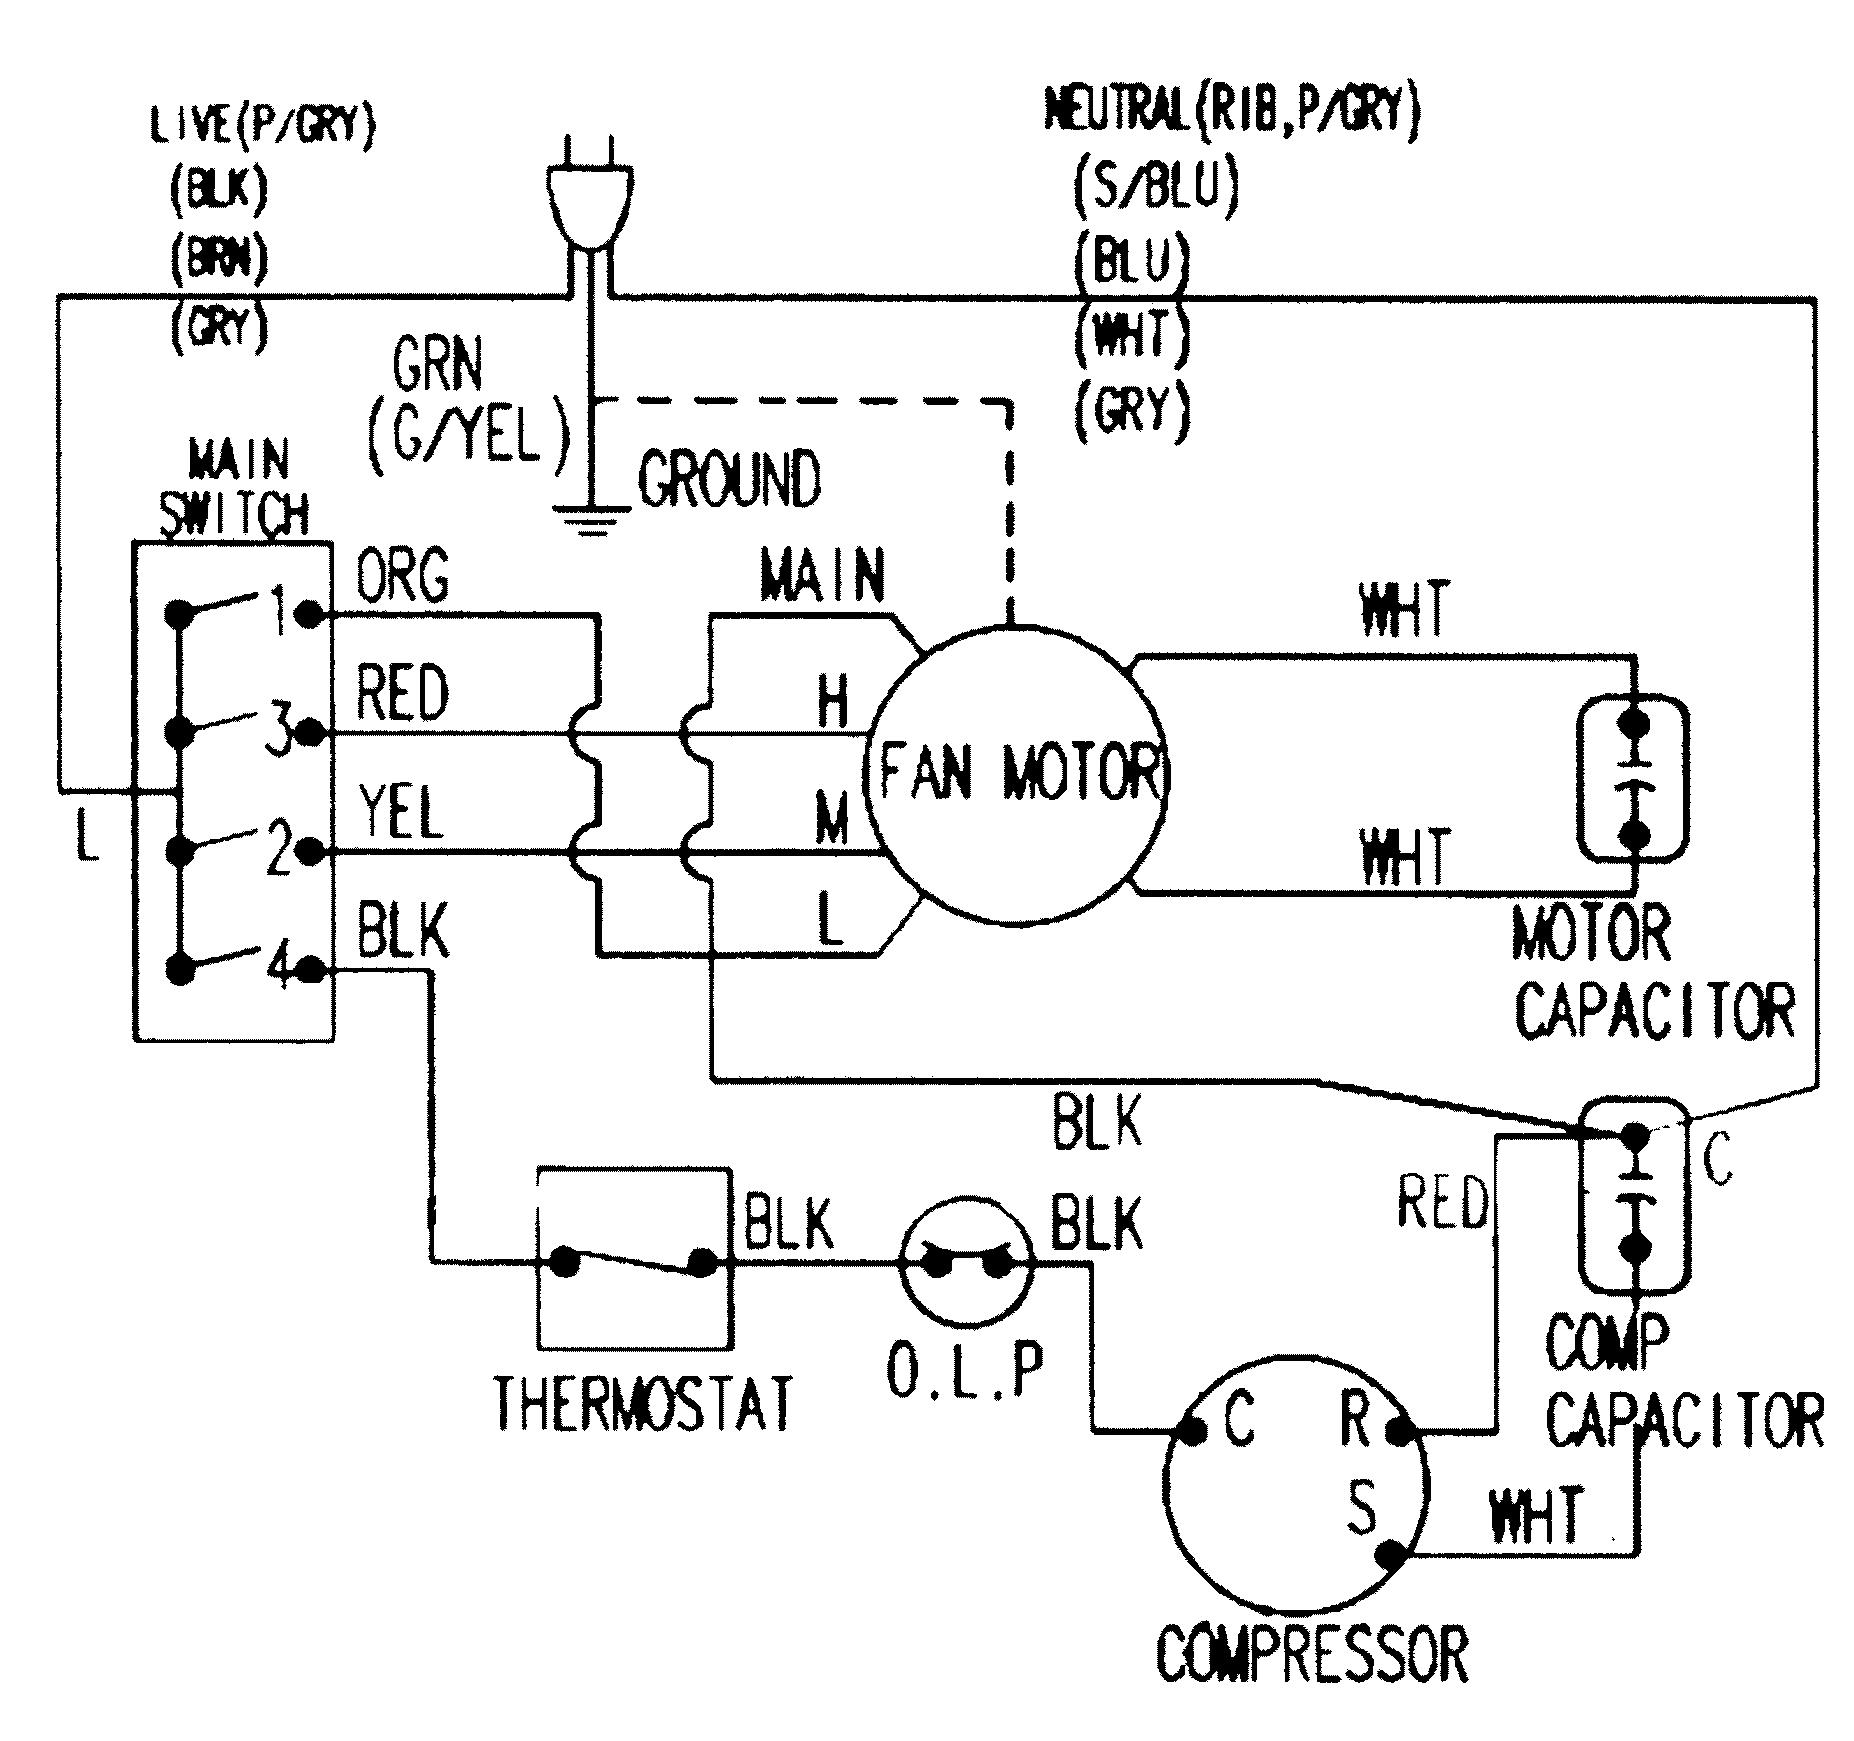 Vav Wiring Diagram Mechanical Wiring Riser Drawing Free Wiring – Lg Heat Pump Wiring Diagram